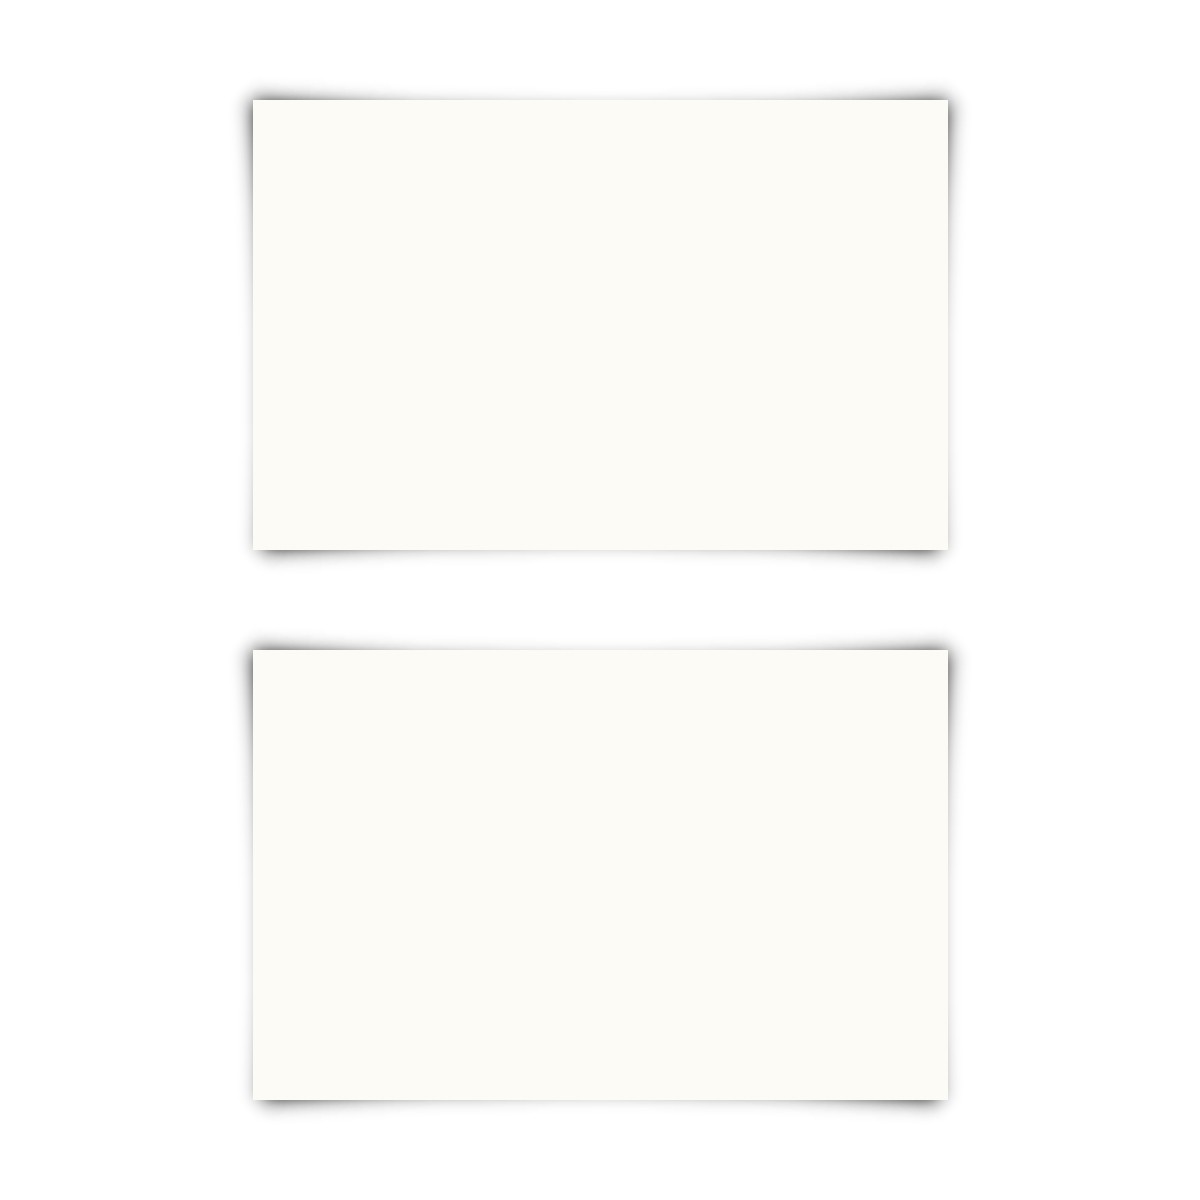 50 X Blanko Visitenkarten 85x55mm Naturpapier 300g Qm